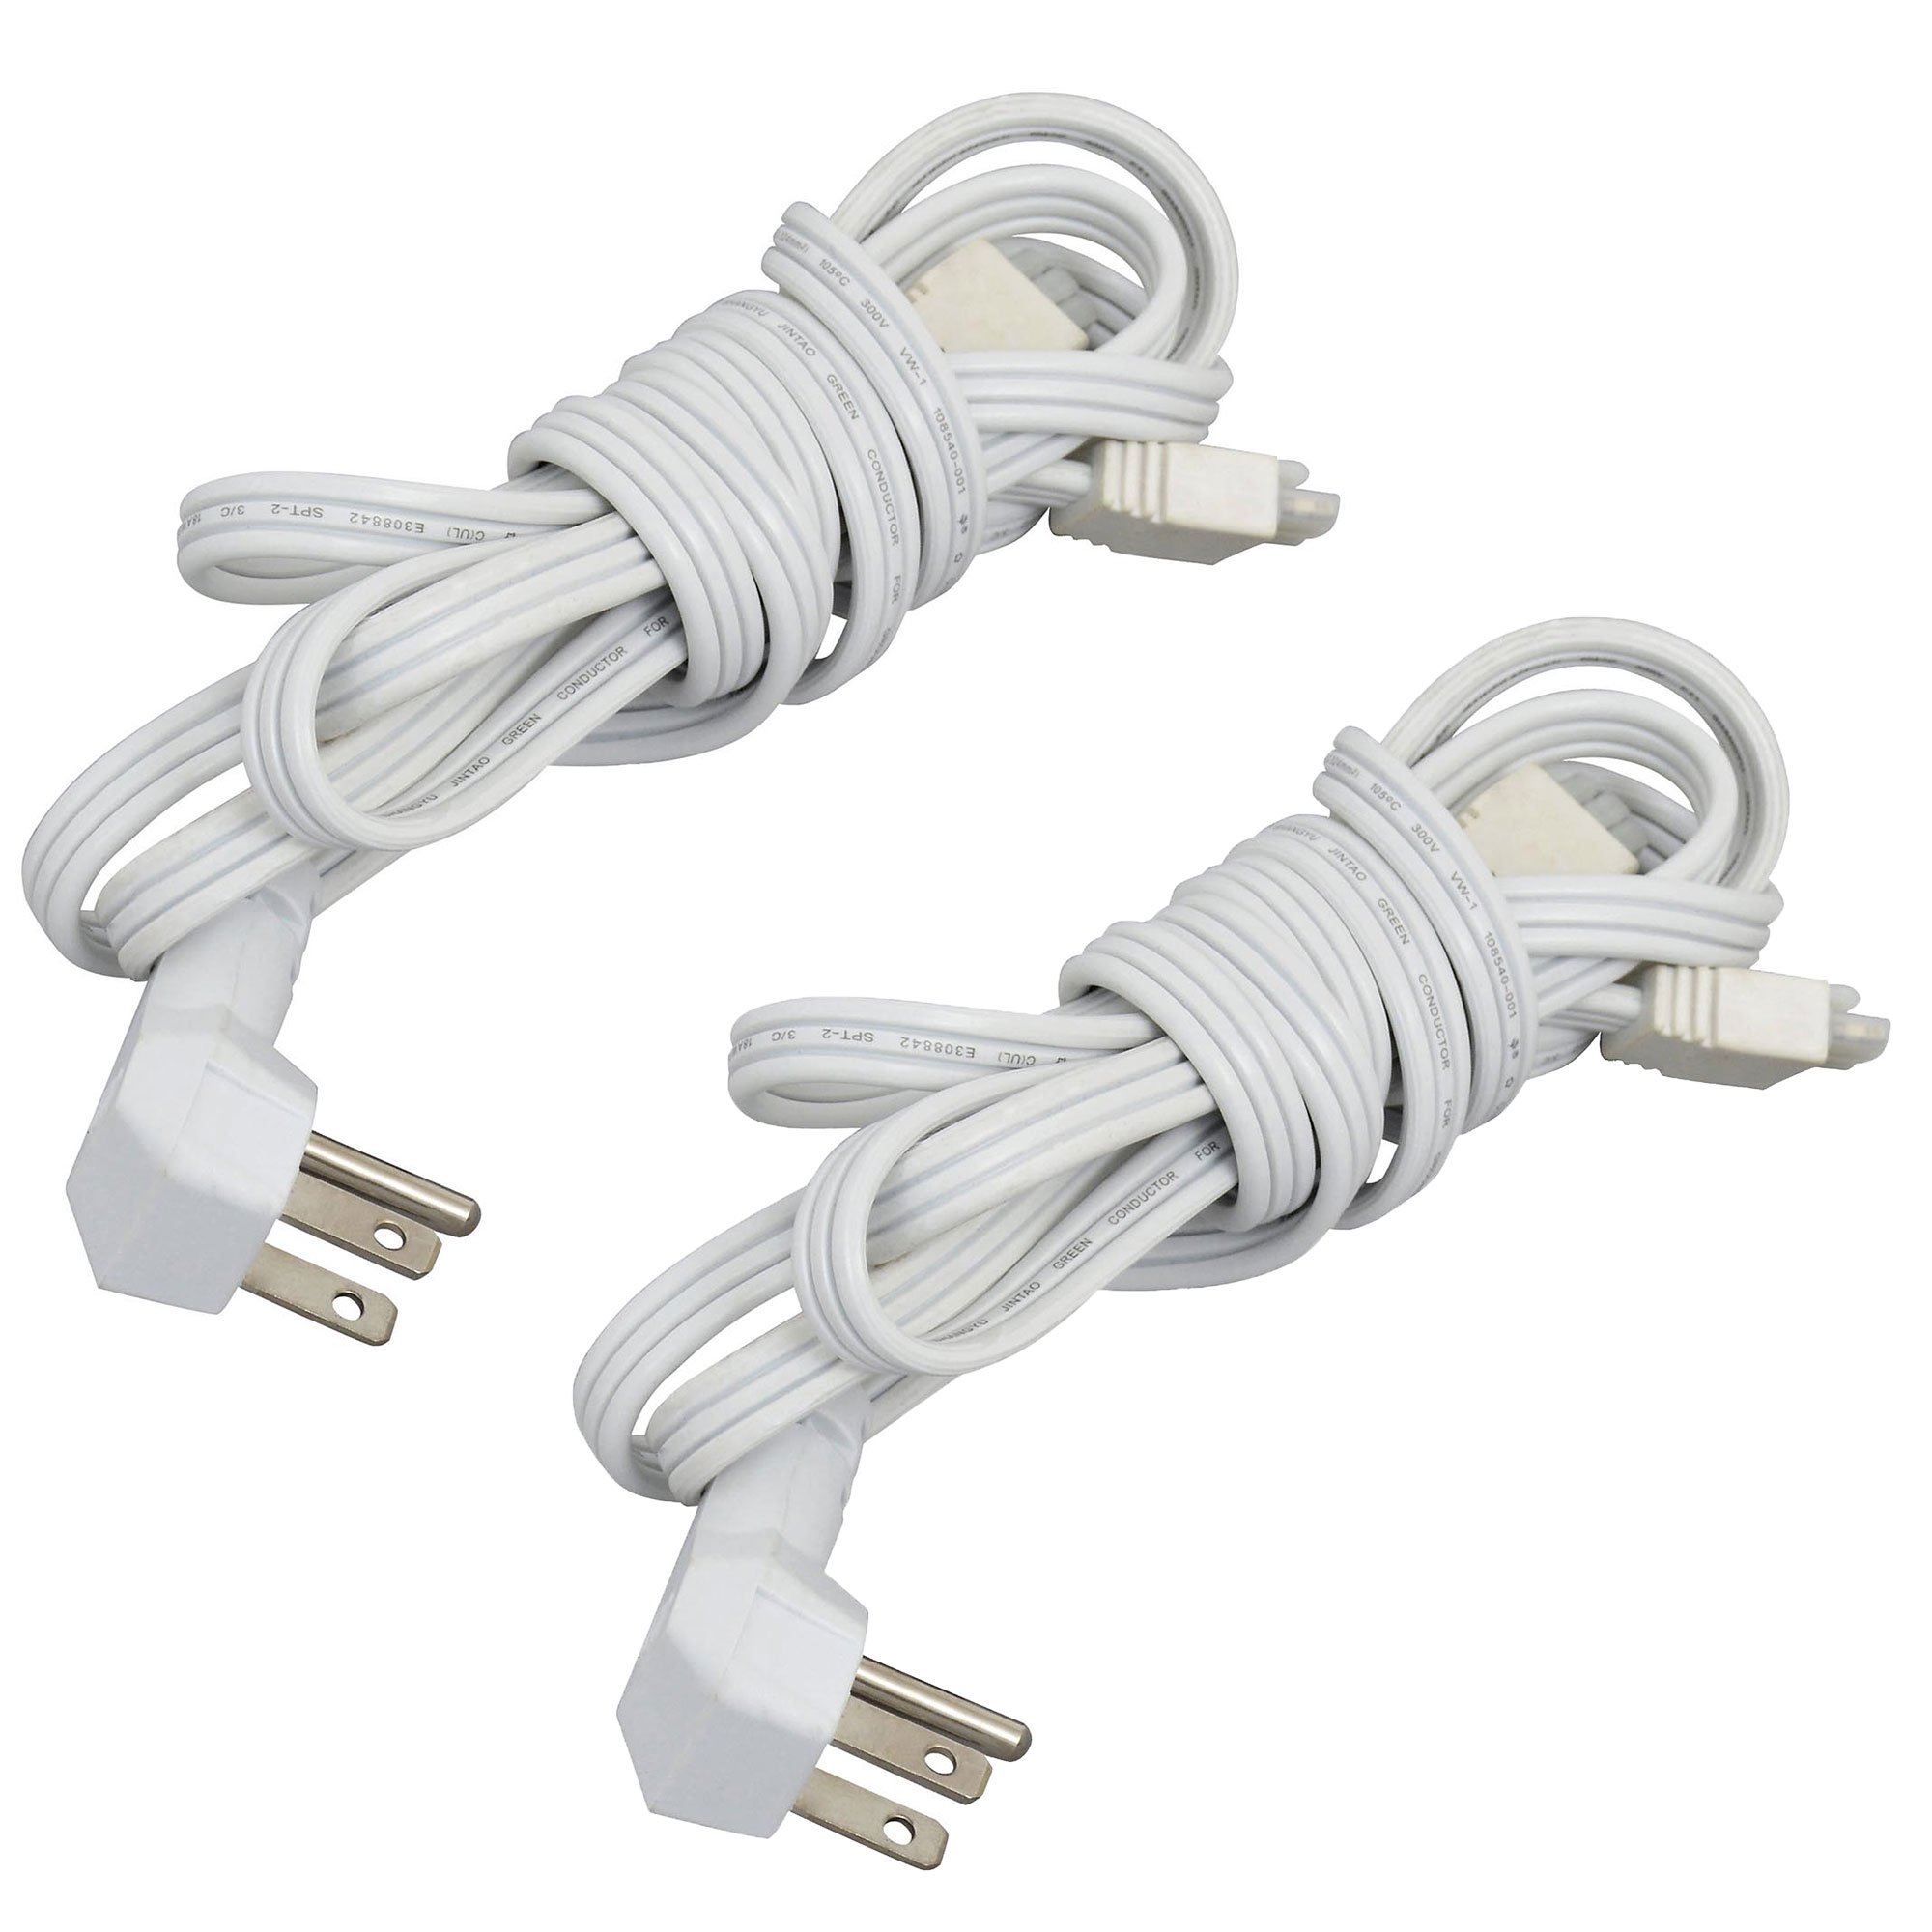 Sylvania LIGHTIFY Power Cord for LED Under Cabinet Smart Lighting (2 Pack)